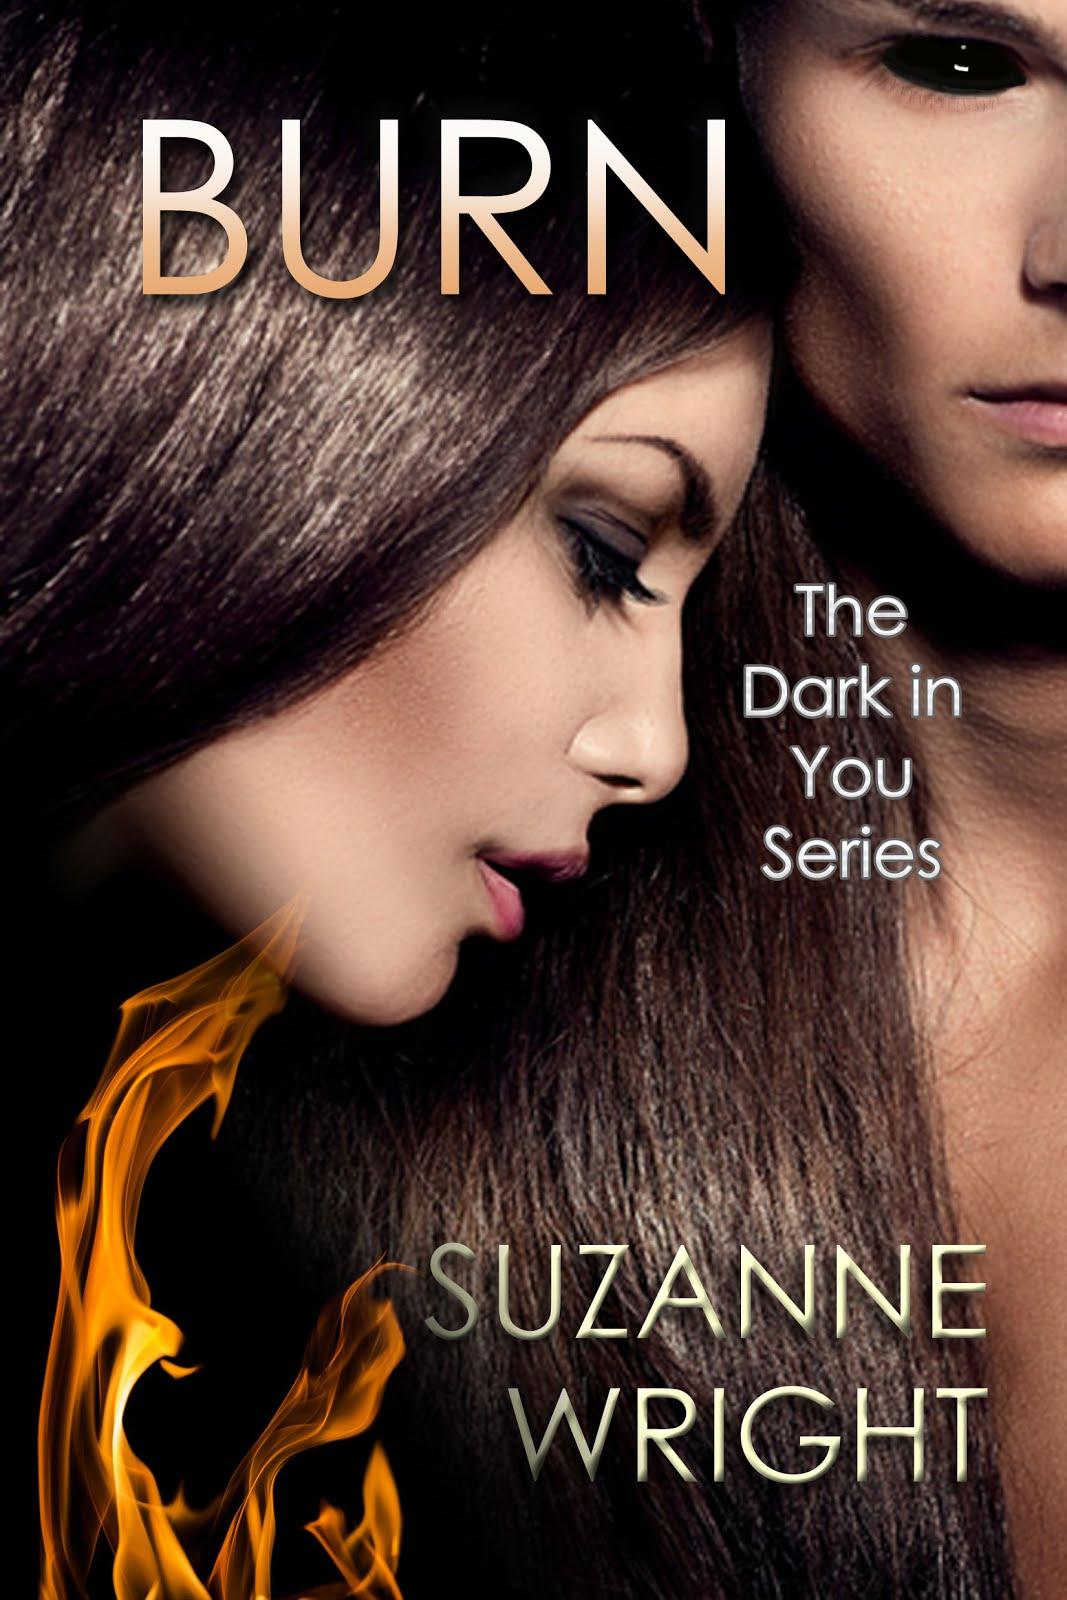 Burn, July 1 2015